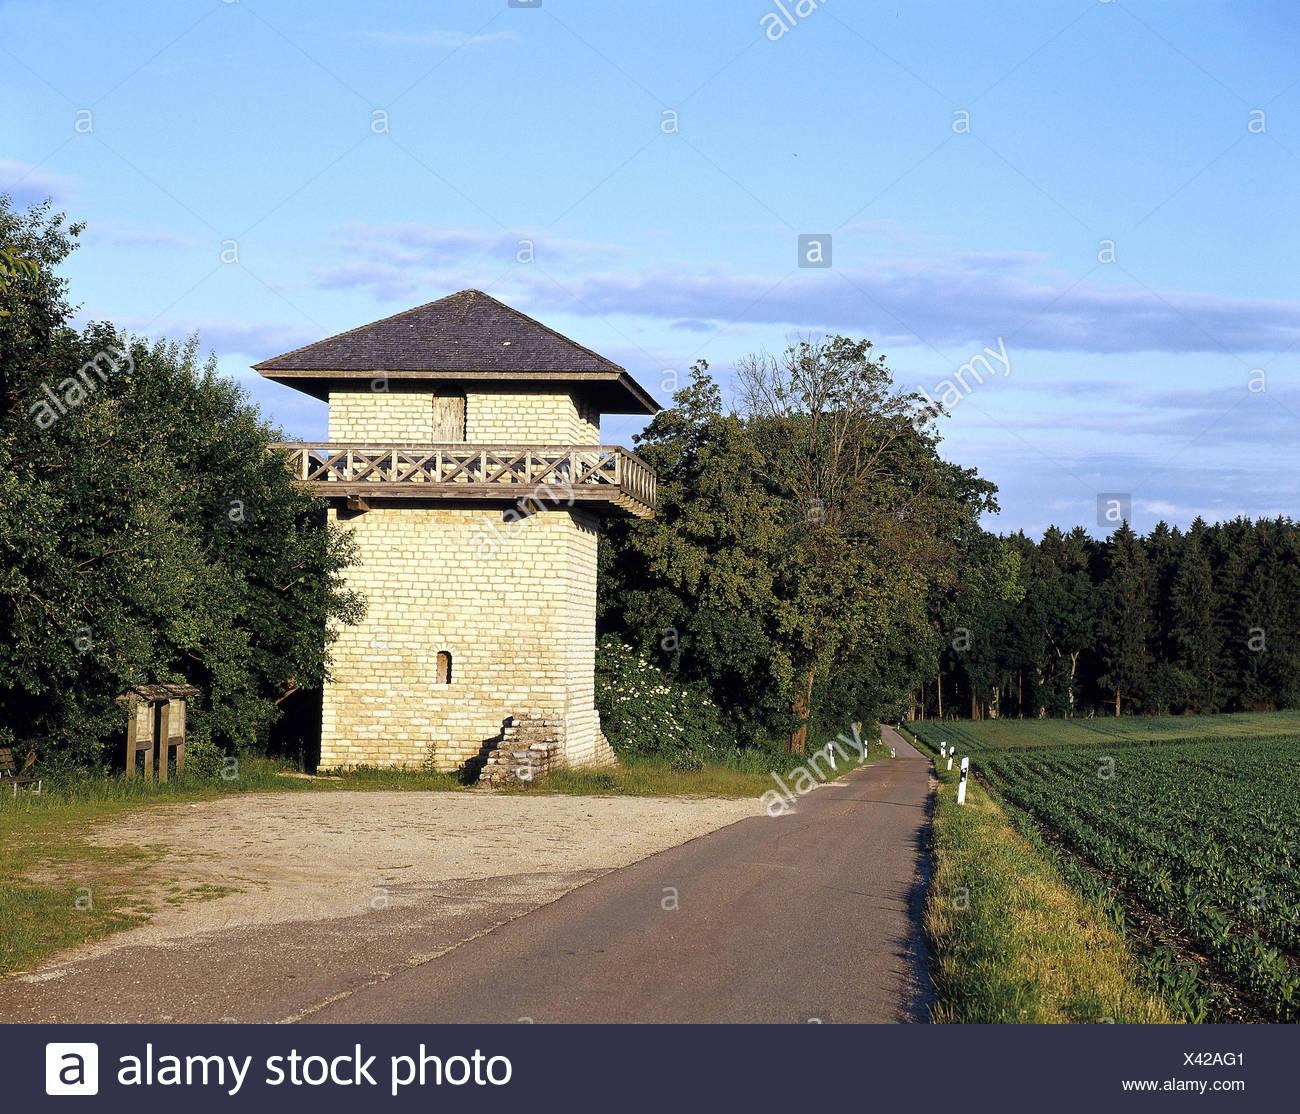 Germany Linden Rheinland Pfalz